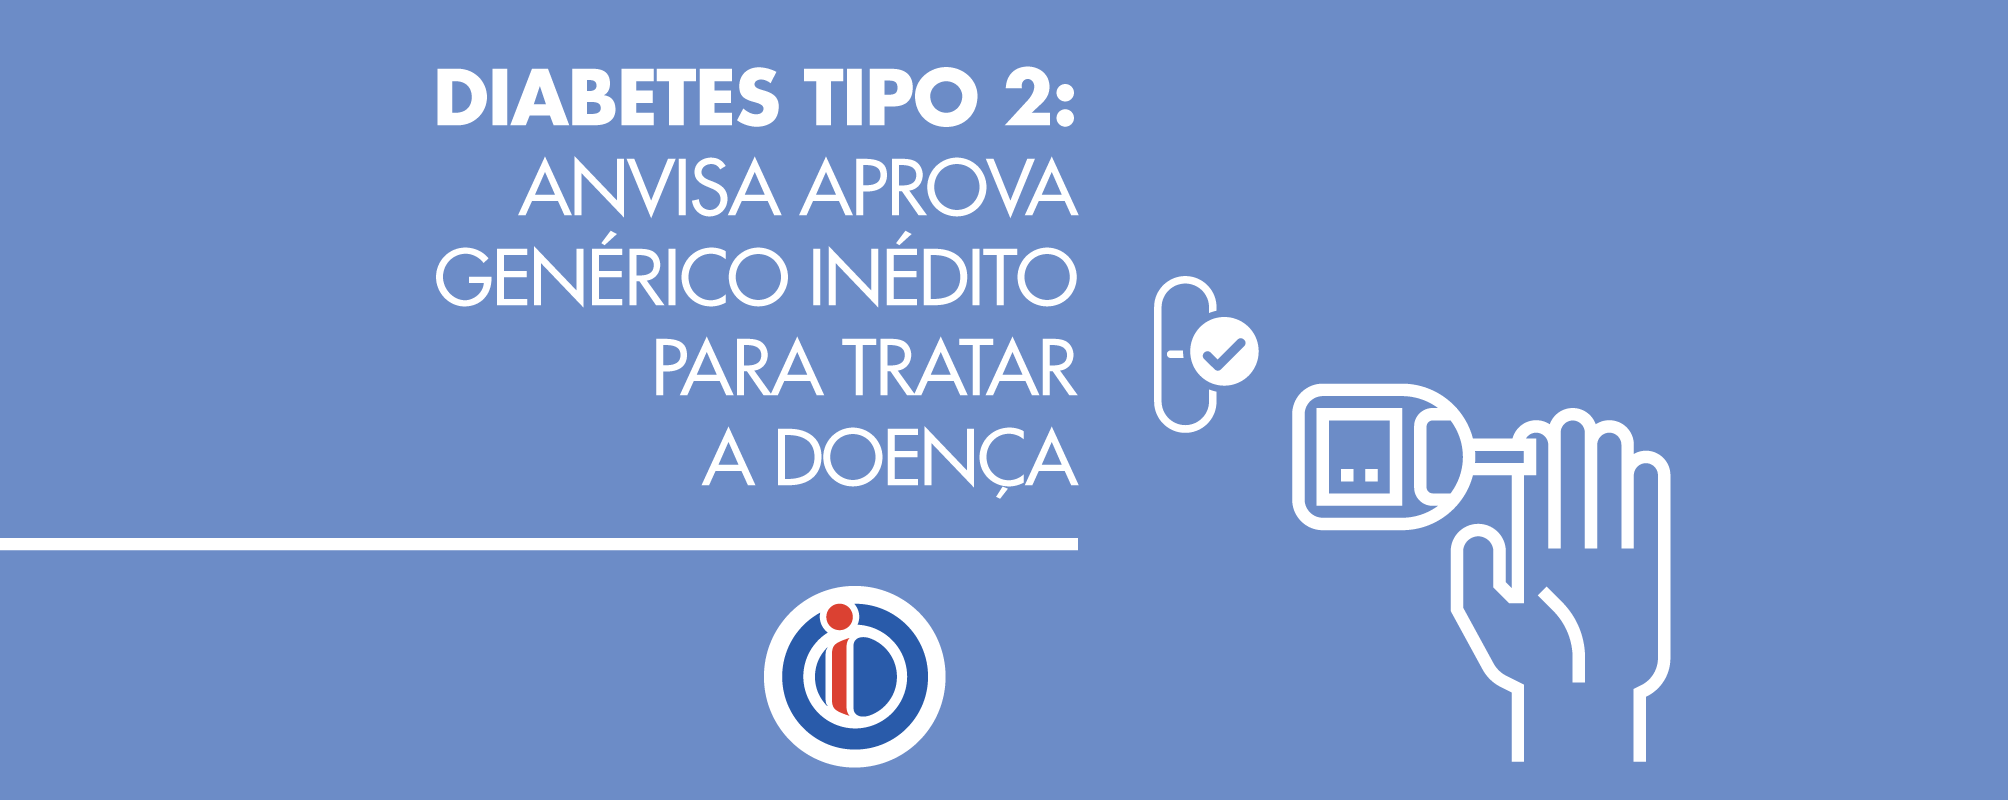 Diabetes Tipo 2: ANVISA aprova genérico inédito para